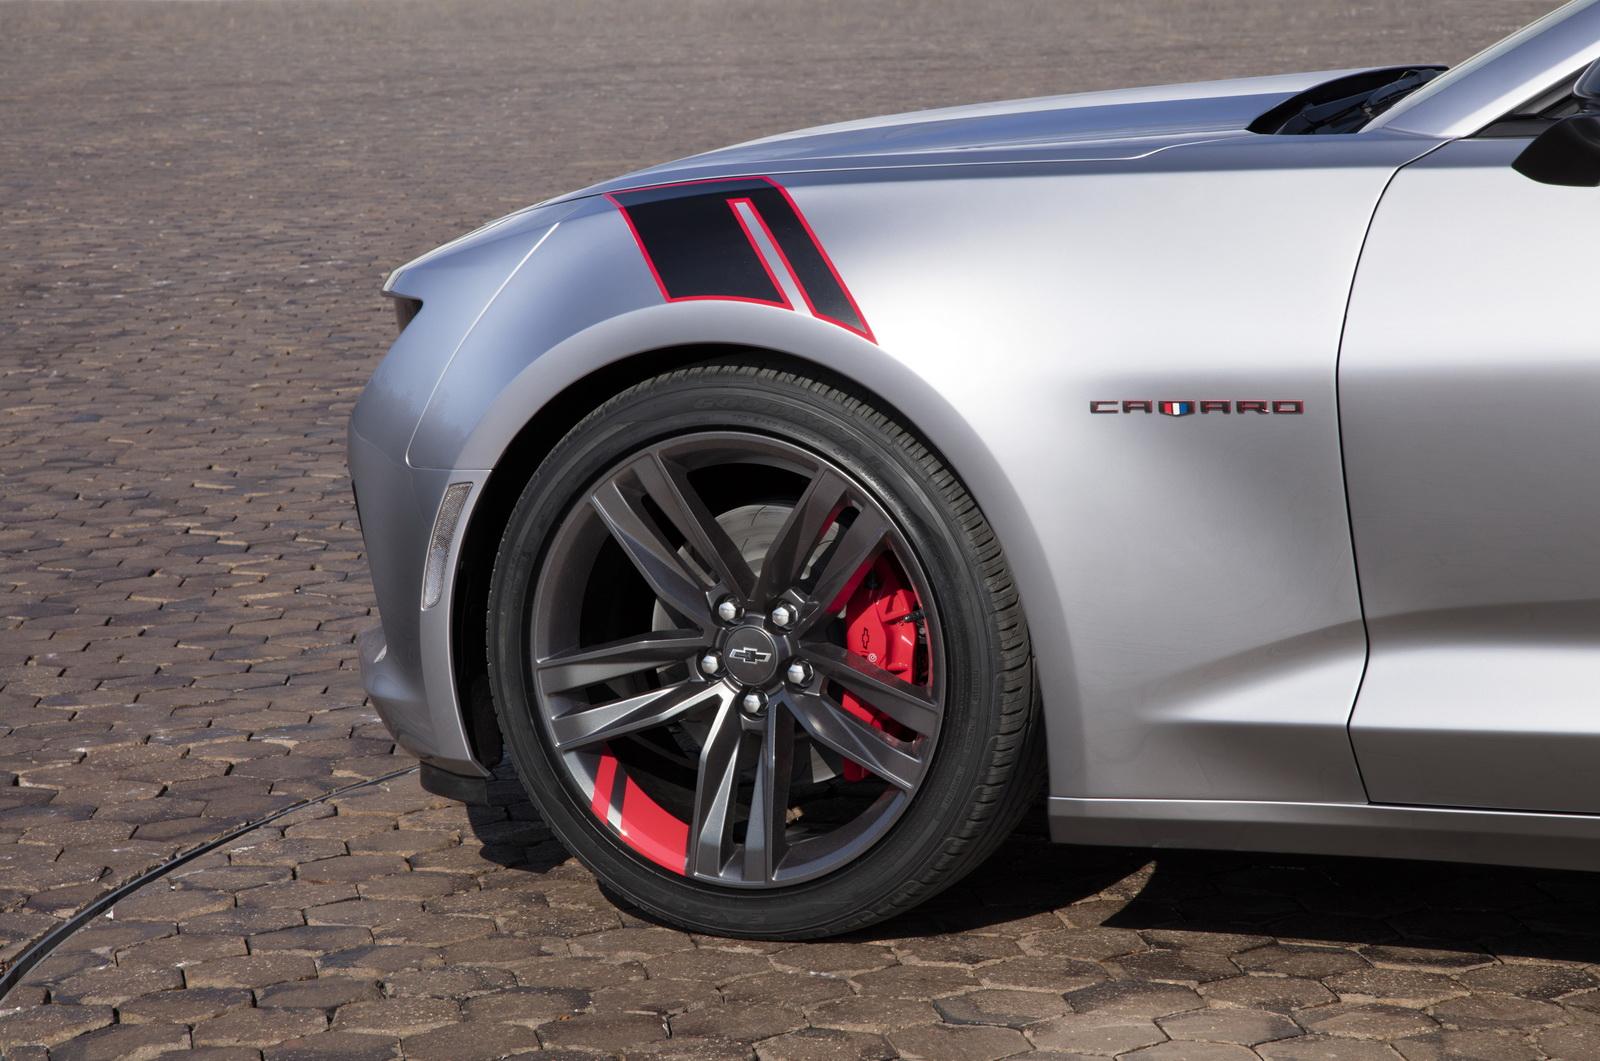 2016 - [Chevrolet] Camaro VI - Page 5 2015-SEMA-Chevrolet-Camaro-Red-Line-4